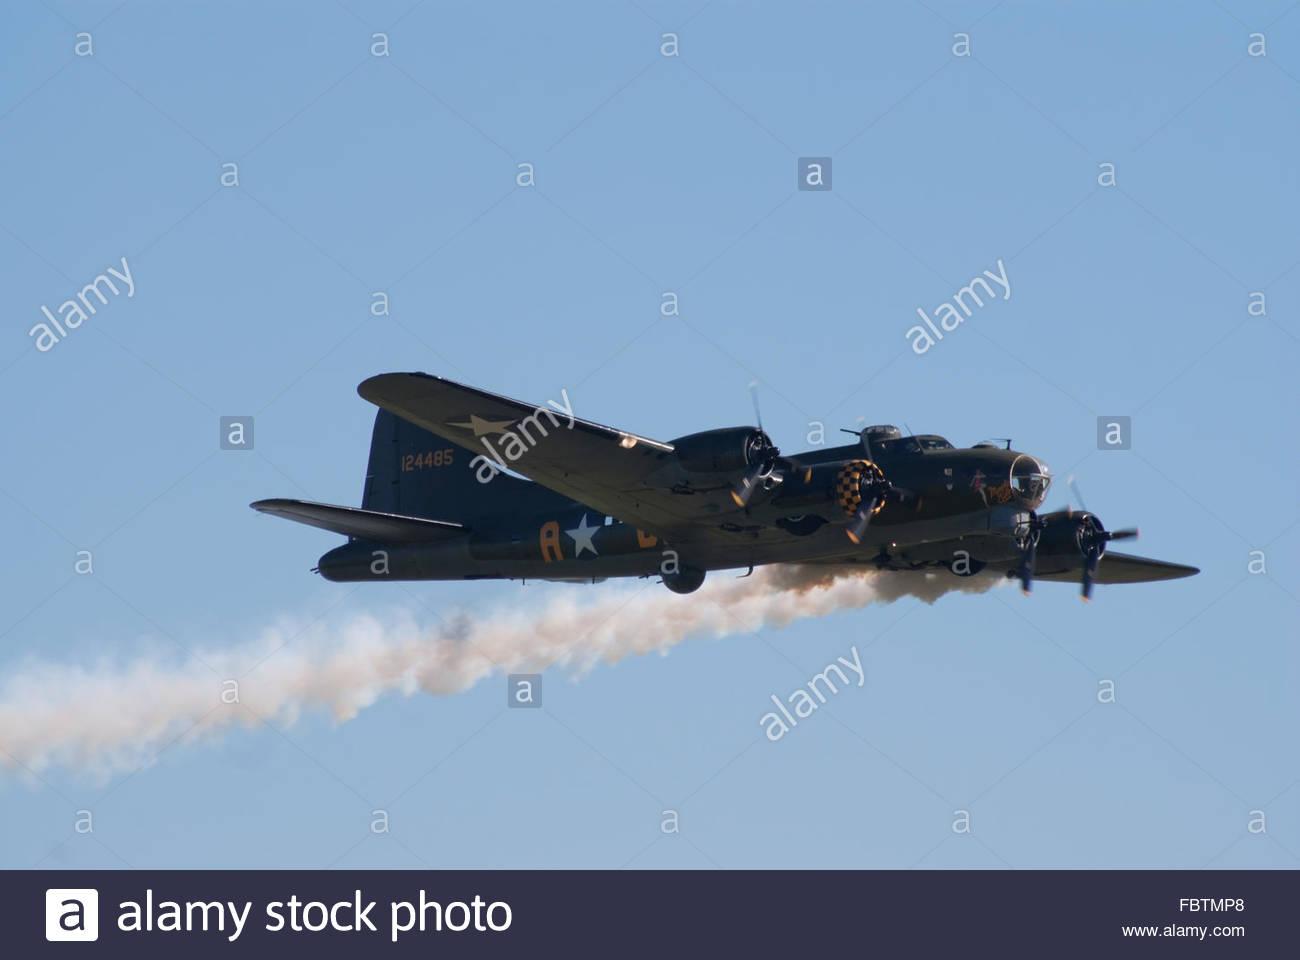 Boeing B-17 flies with smoke trail - Stock Image